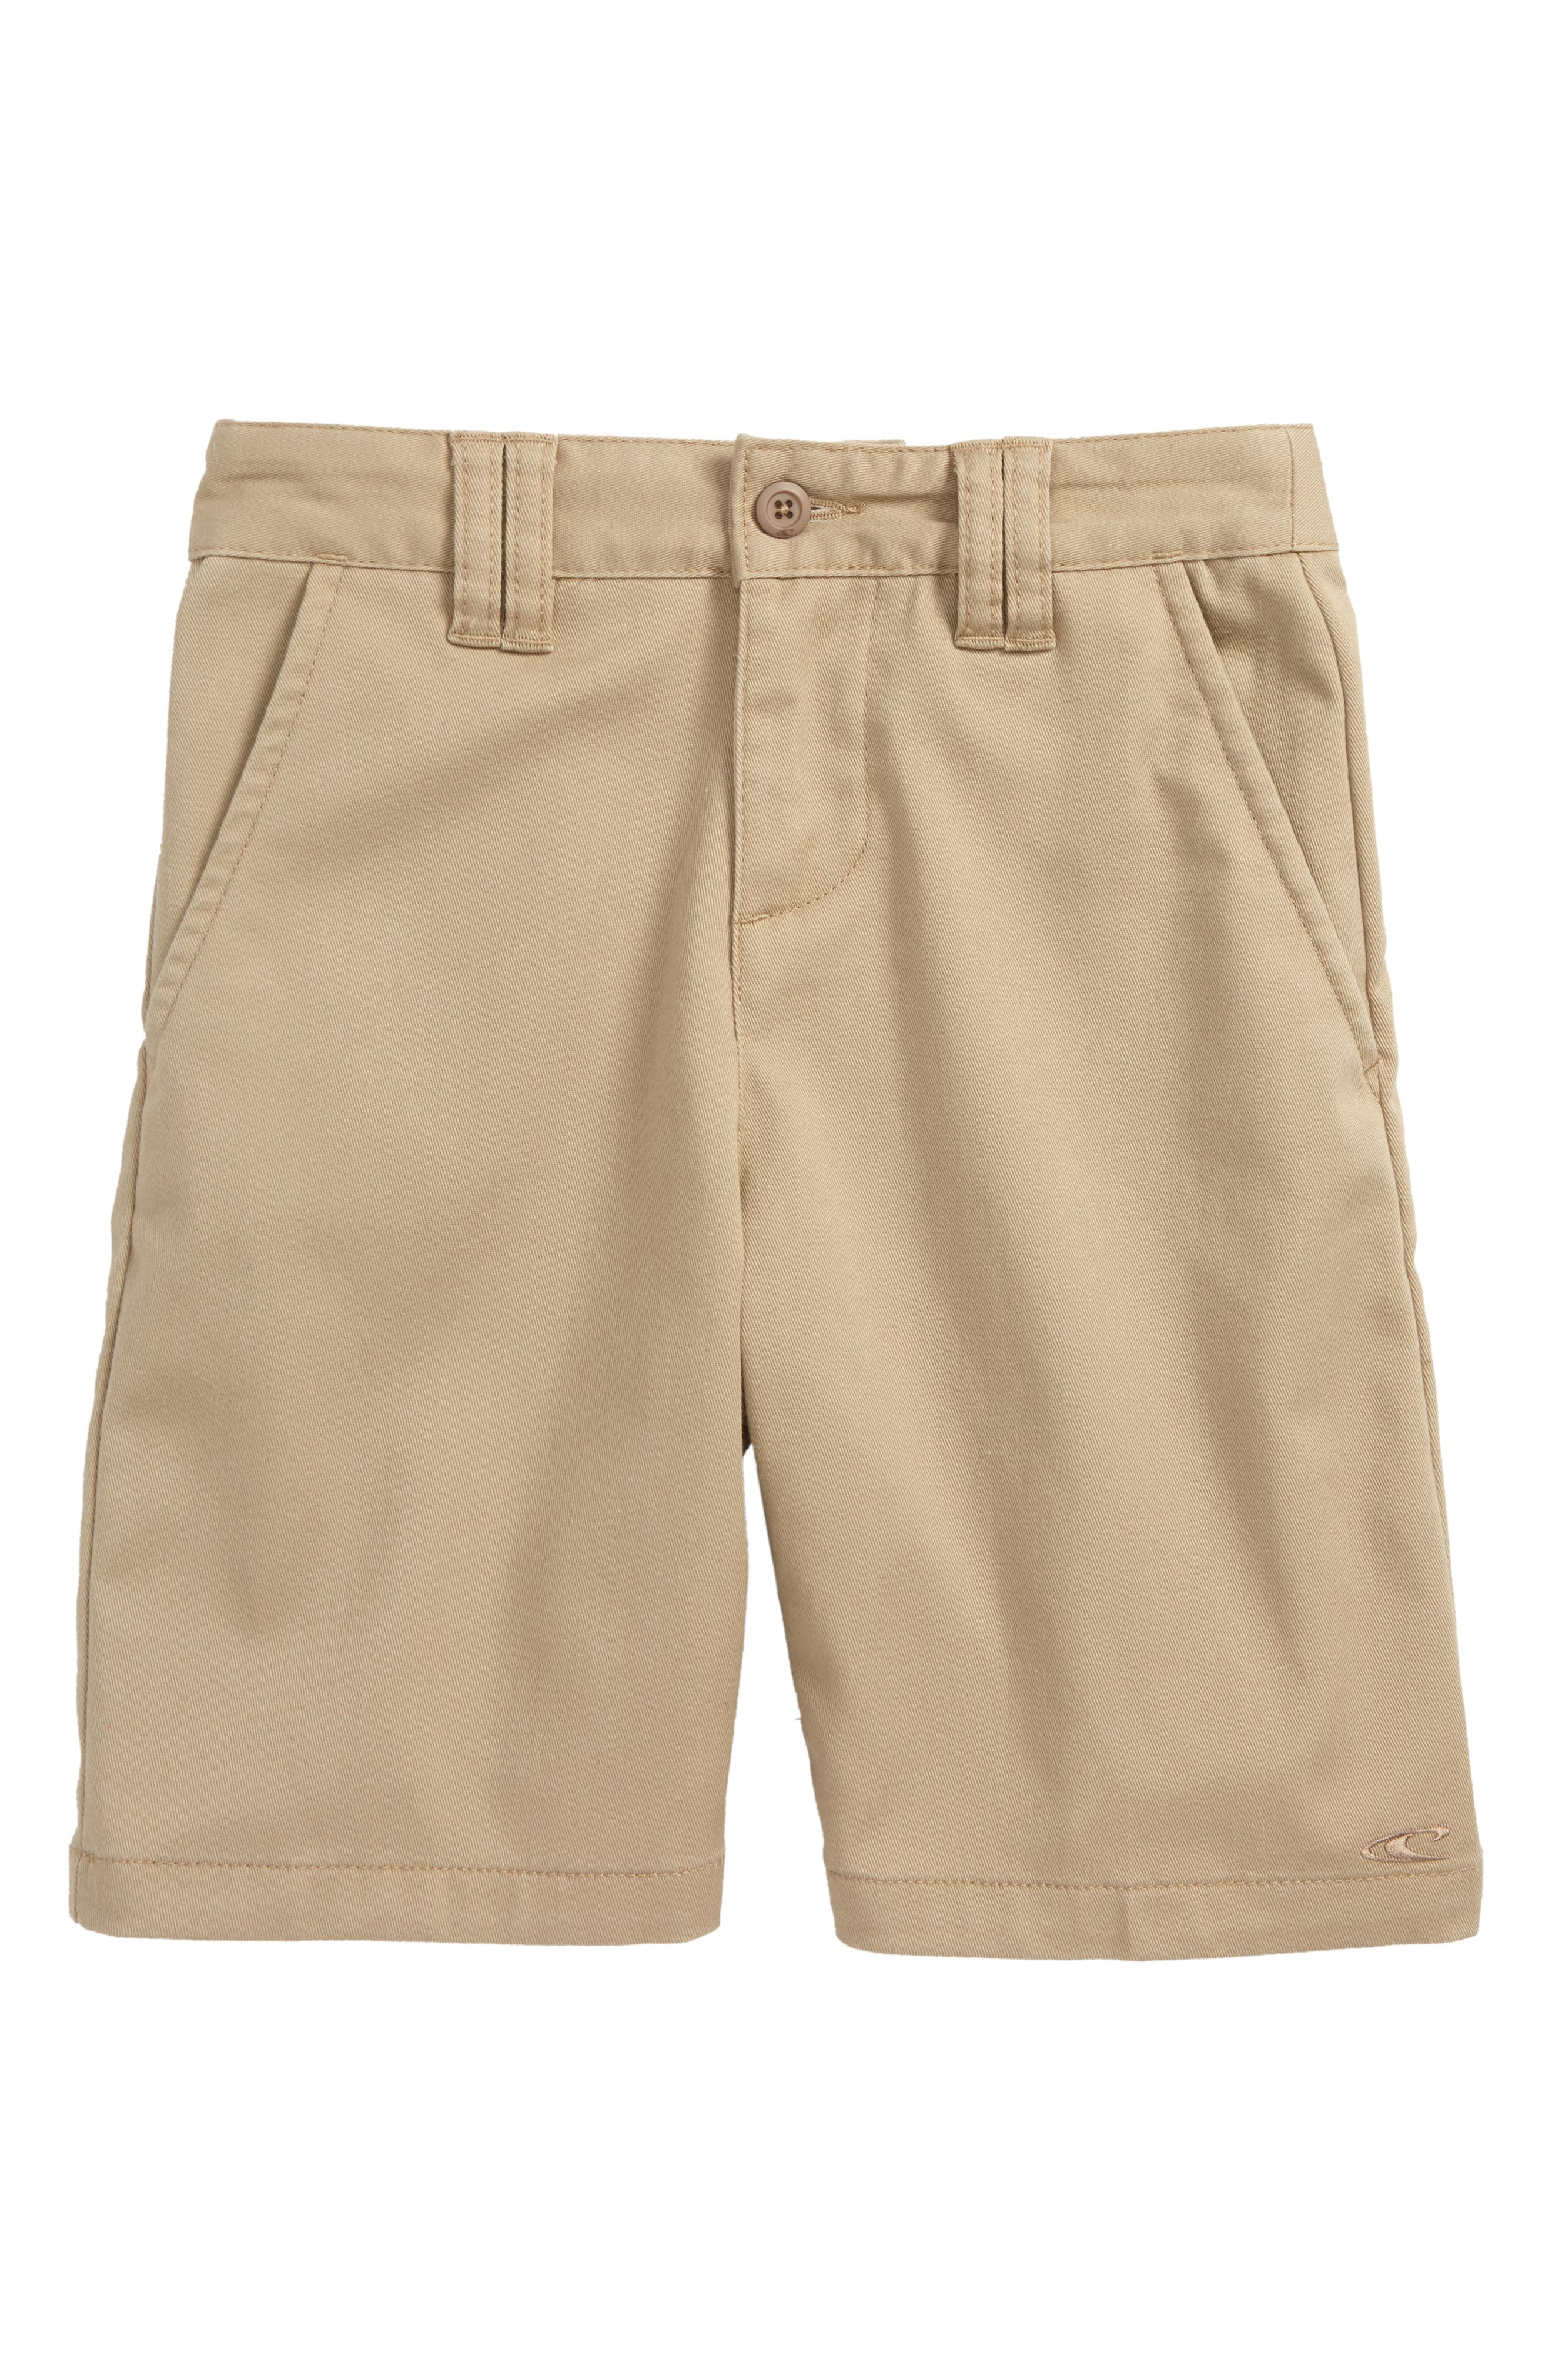 Contact Stretch Shorts,                         Main,                         color, Light Khaki